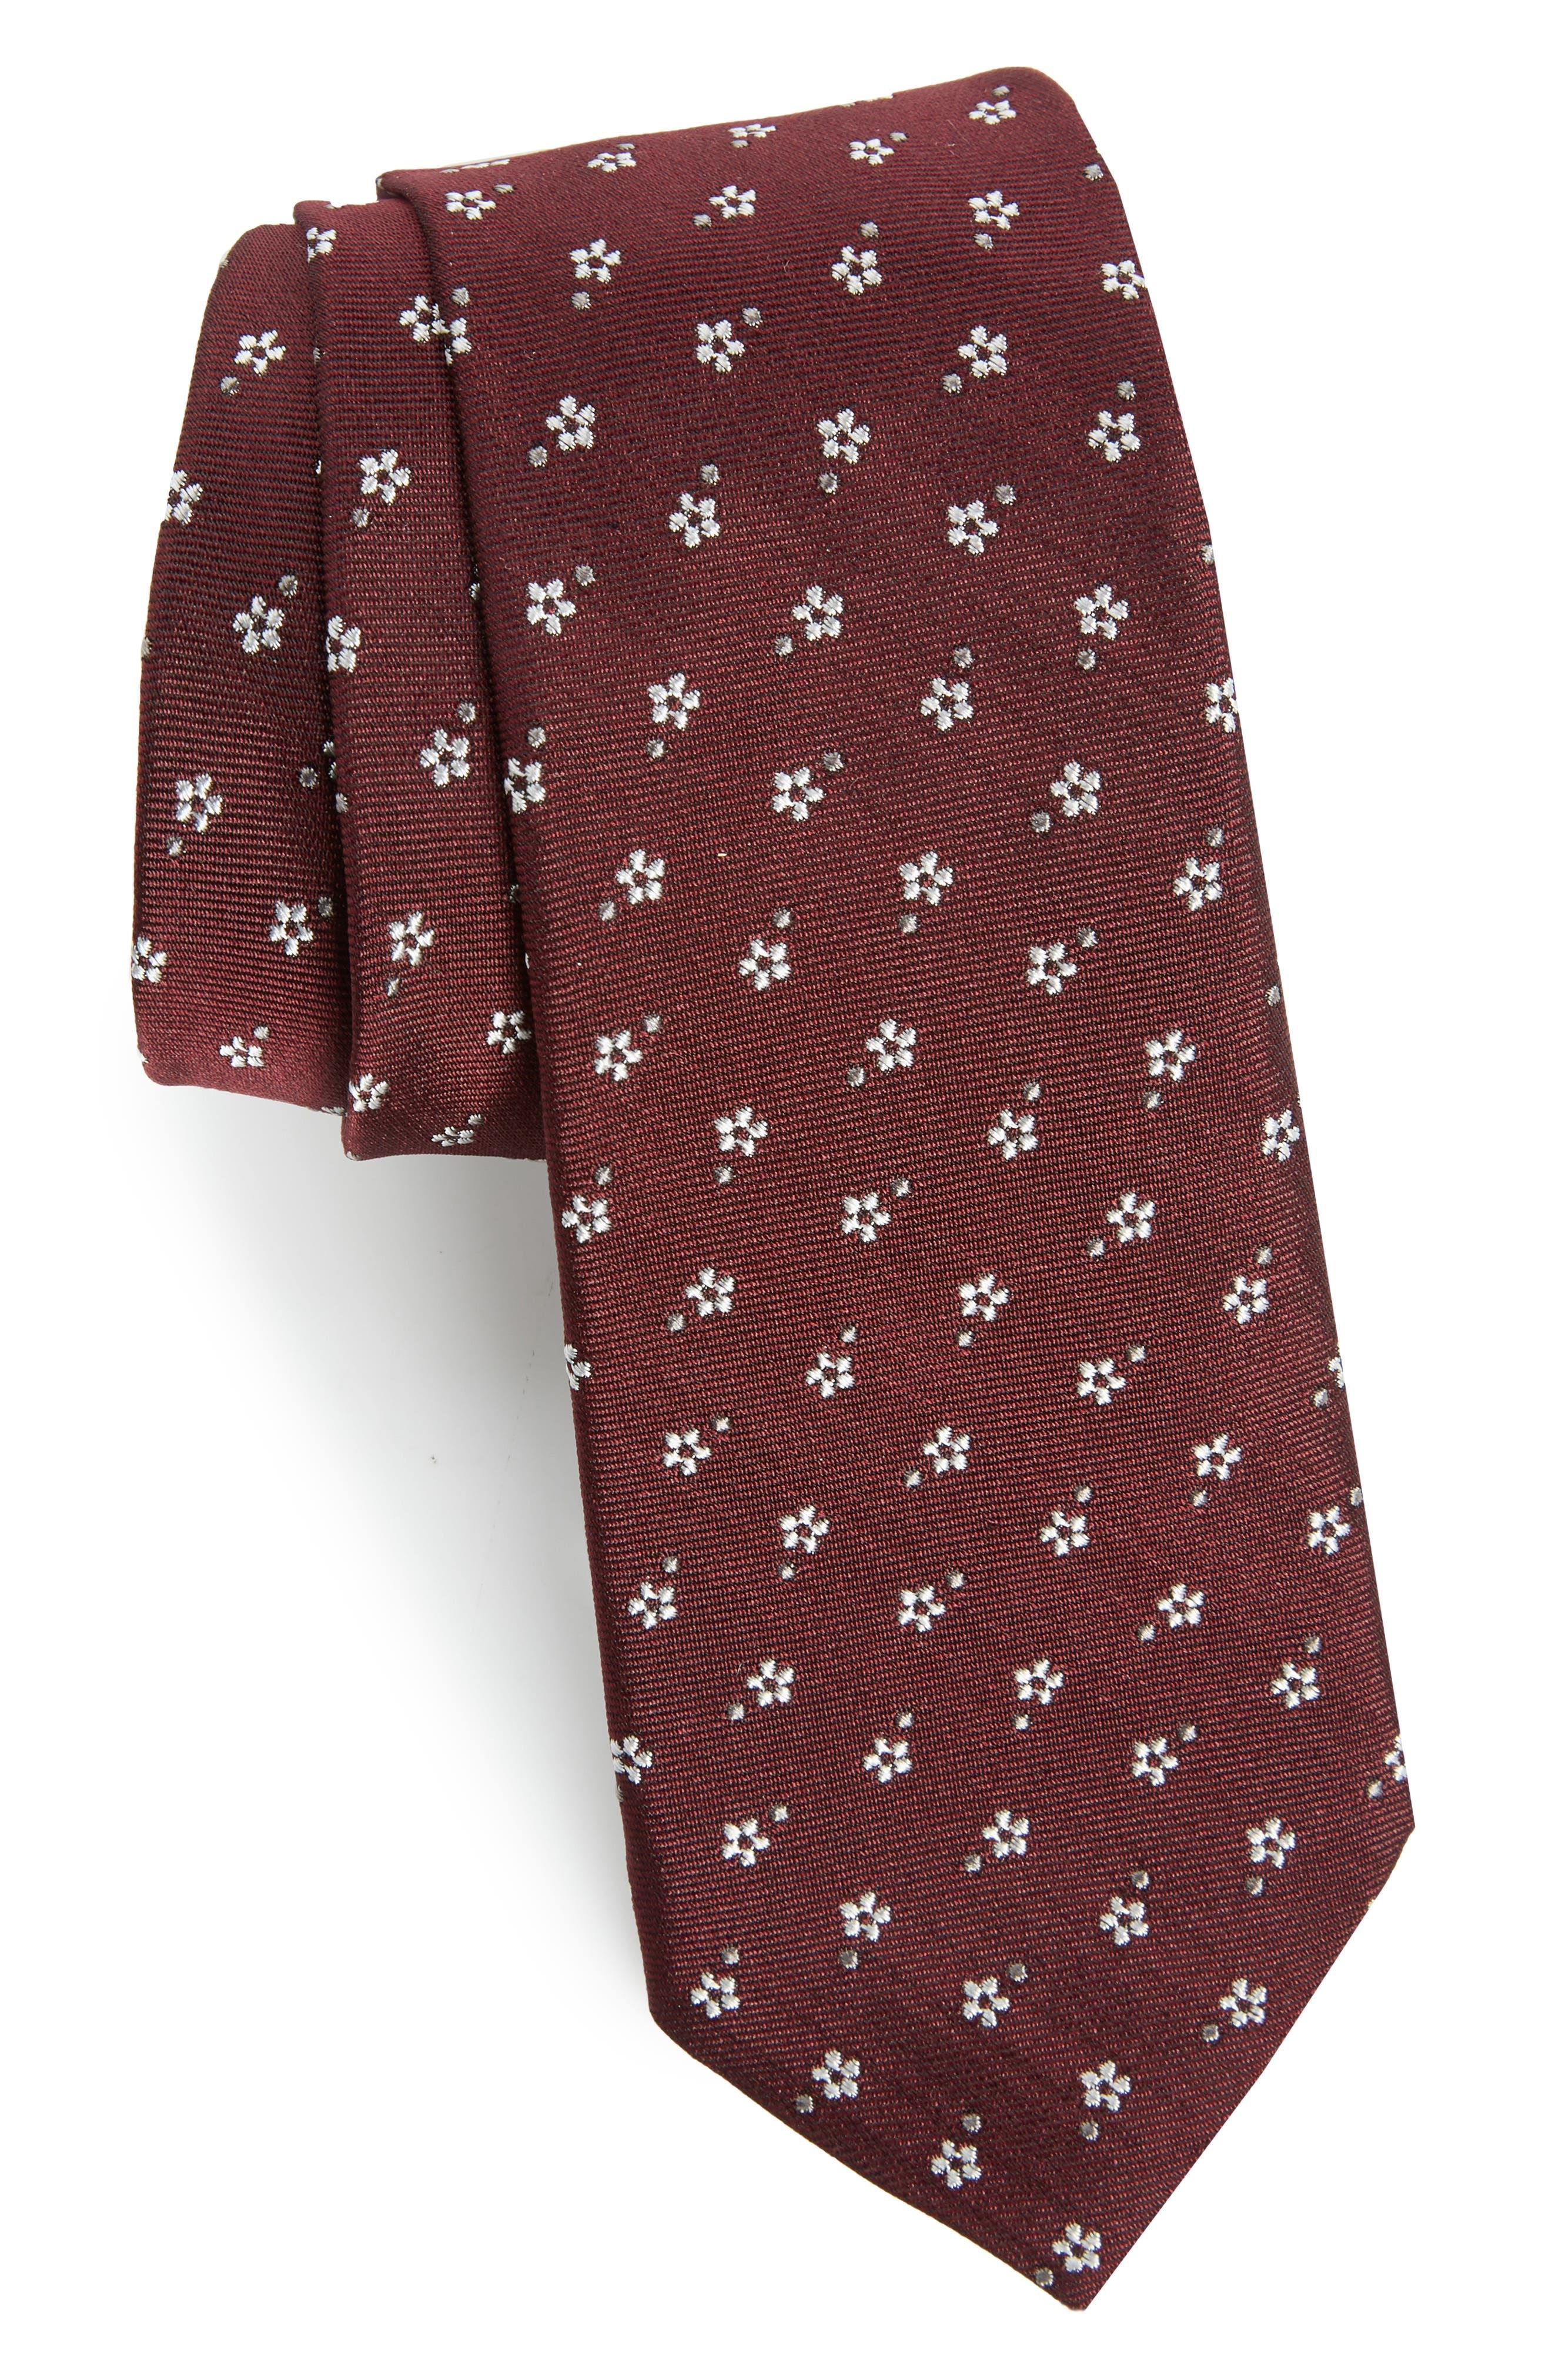 Paul Smith Floral Print Skinny Tie